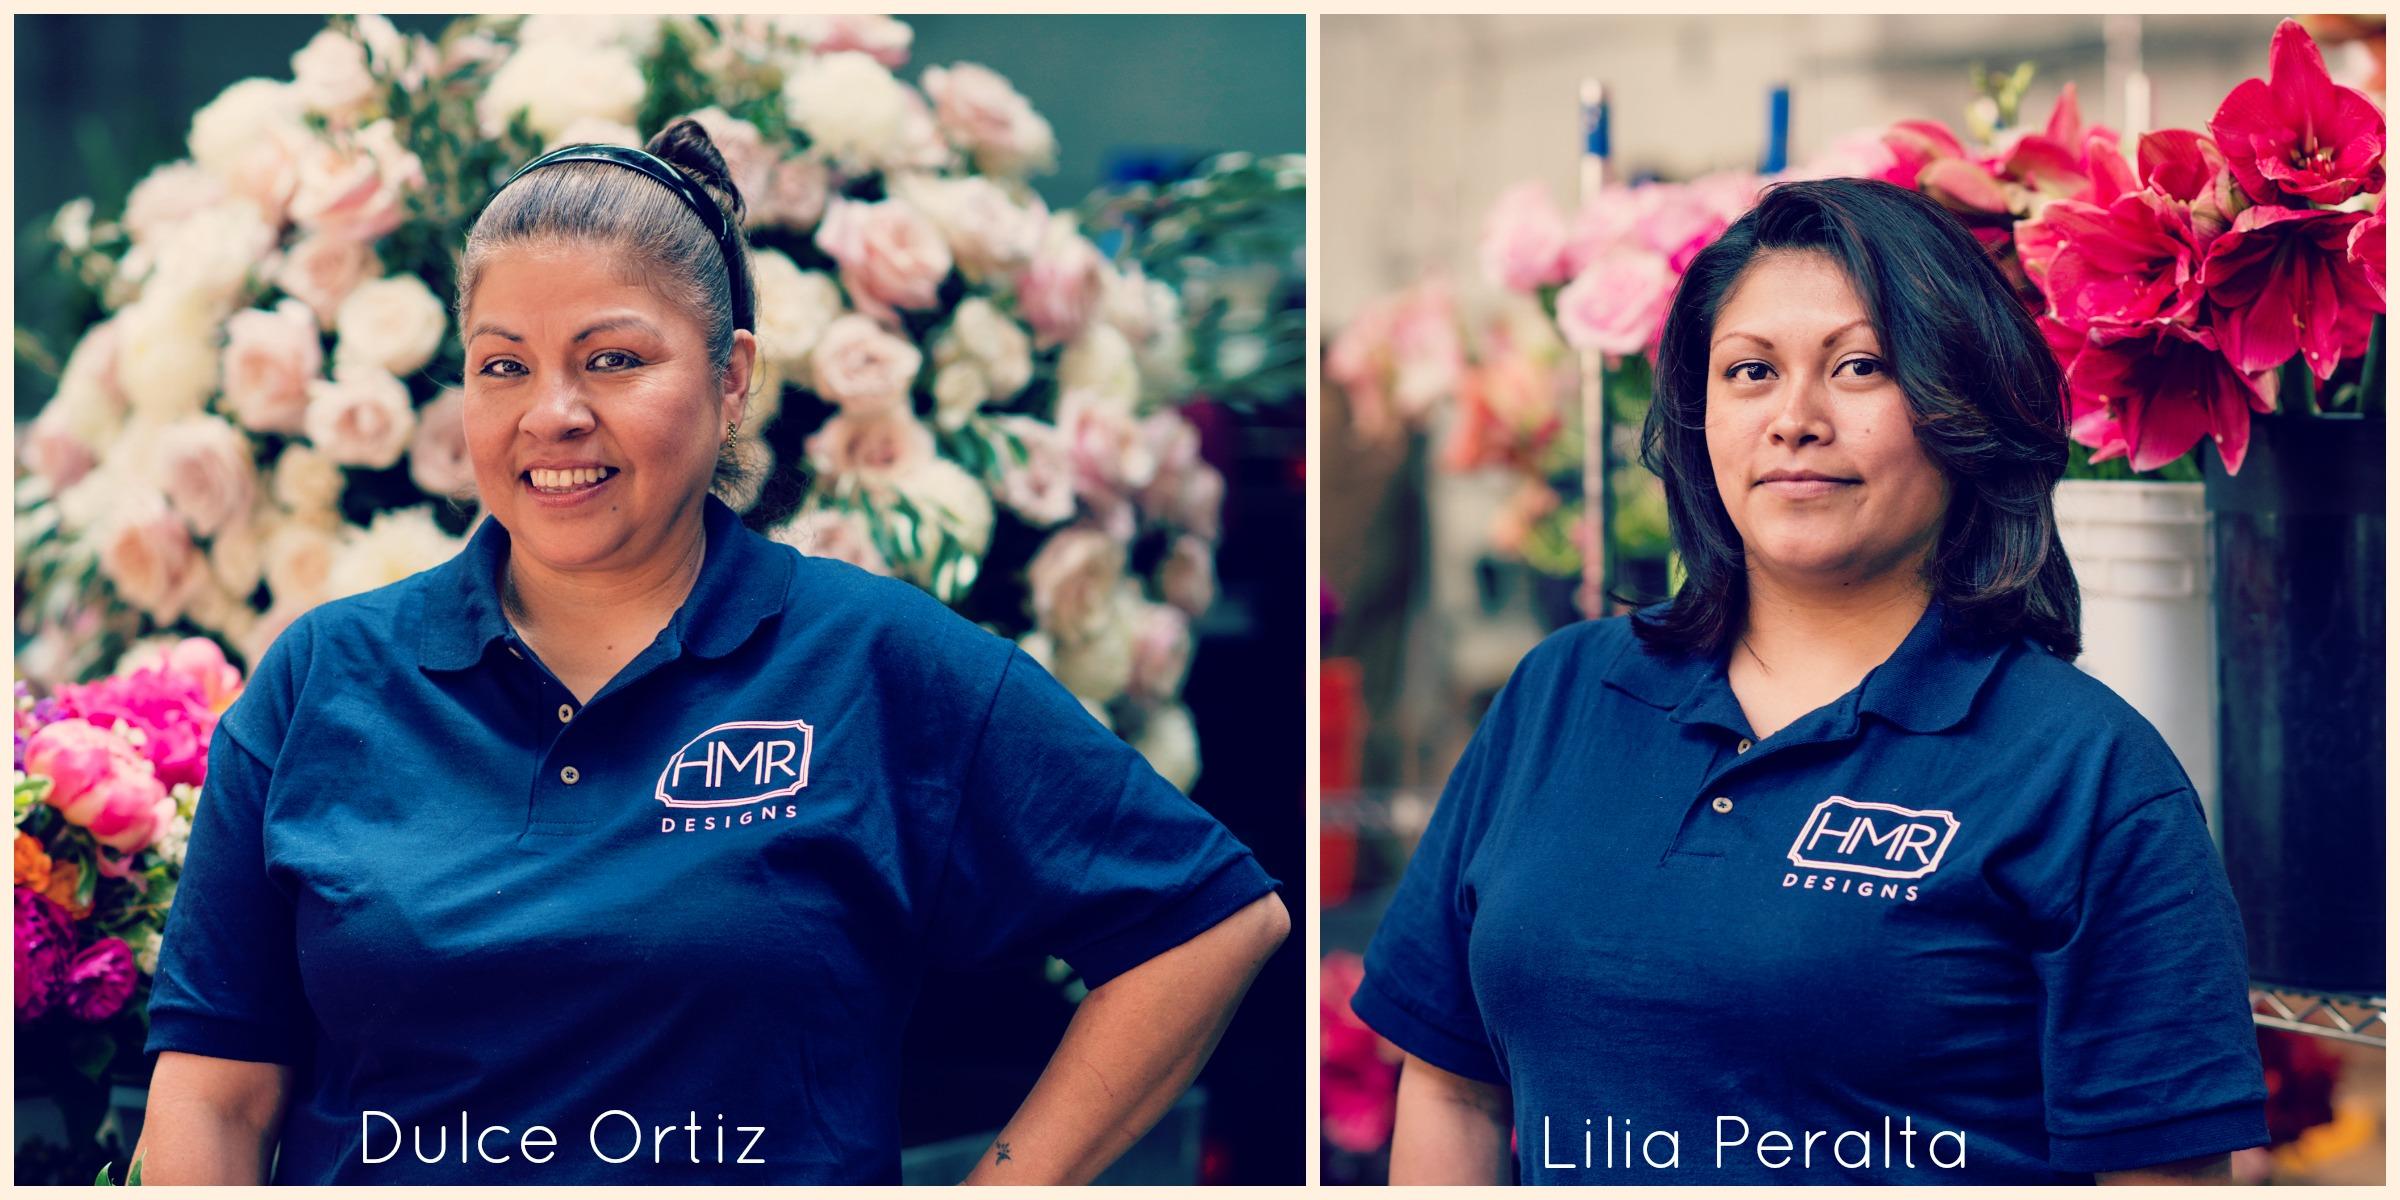 HMR Designs floral processing and design team members